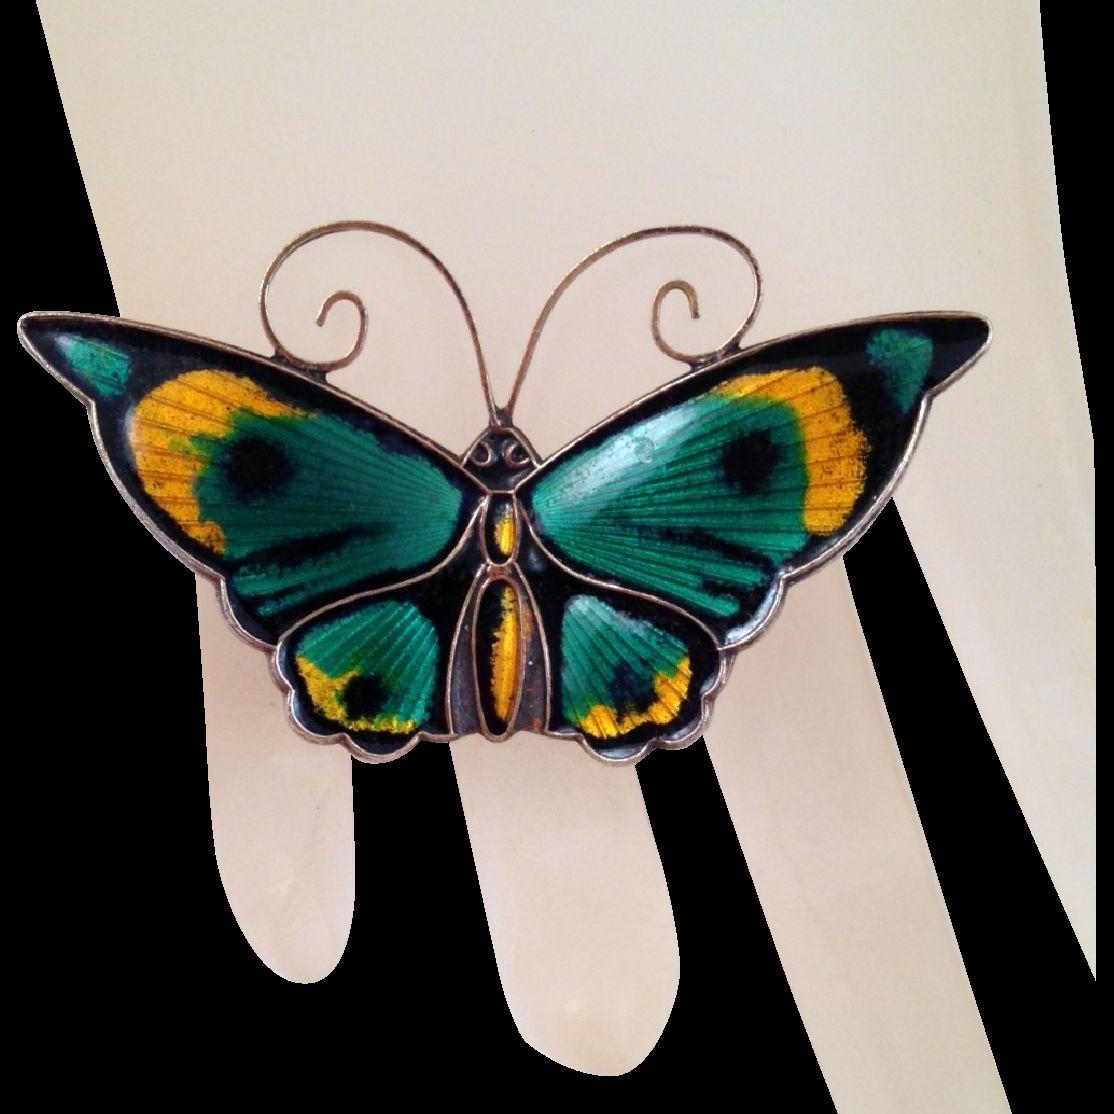 David-Andersen Large Multicolor Enamel Sterling Butterfly Brooch Vintage Guilloche Green Yellow Black